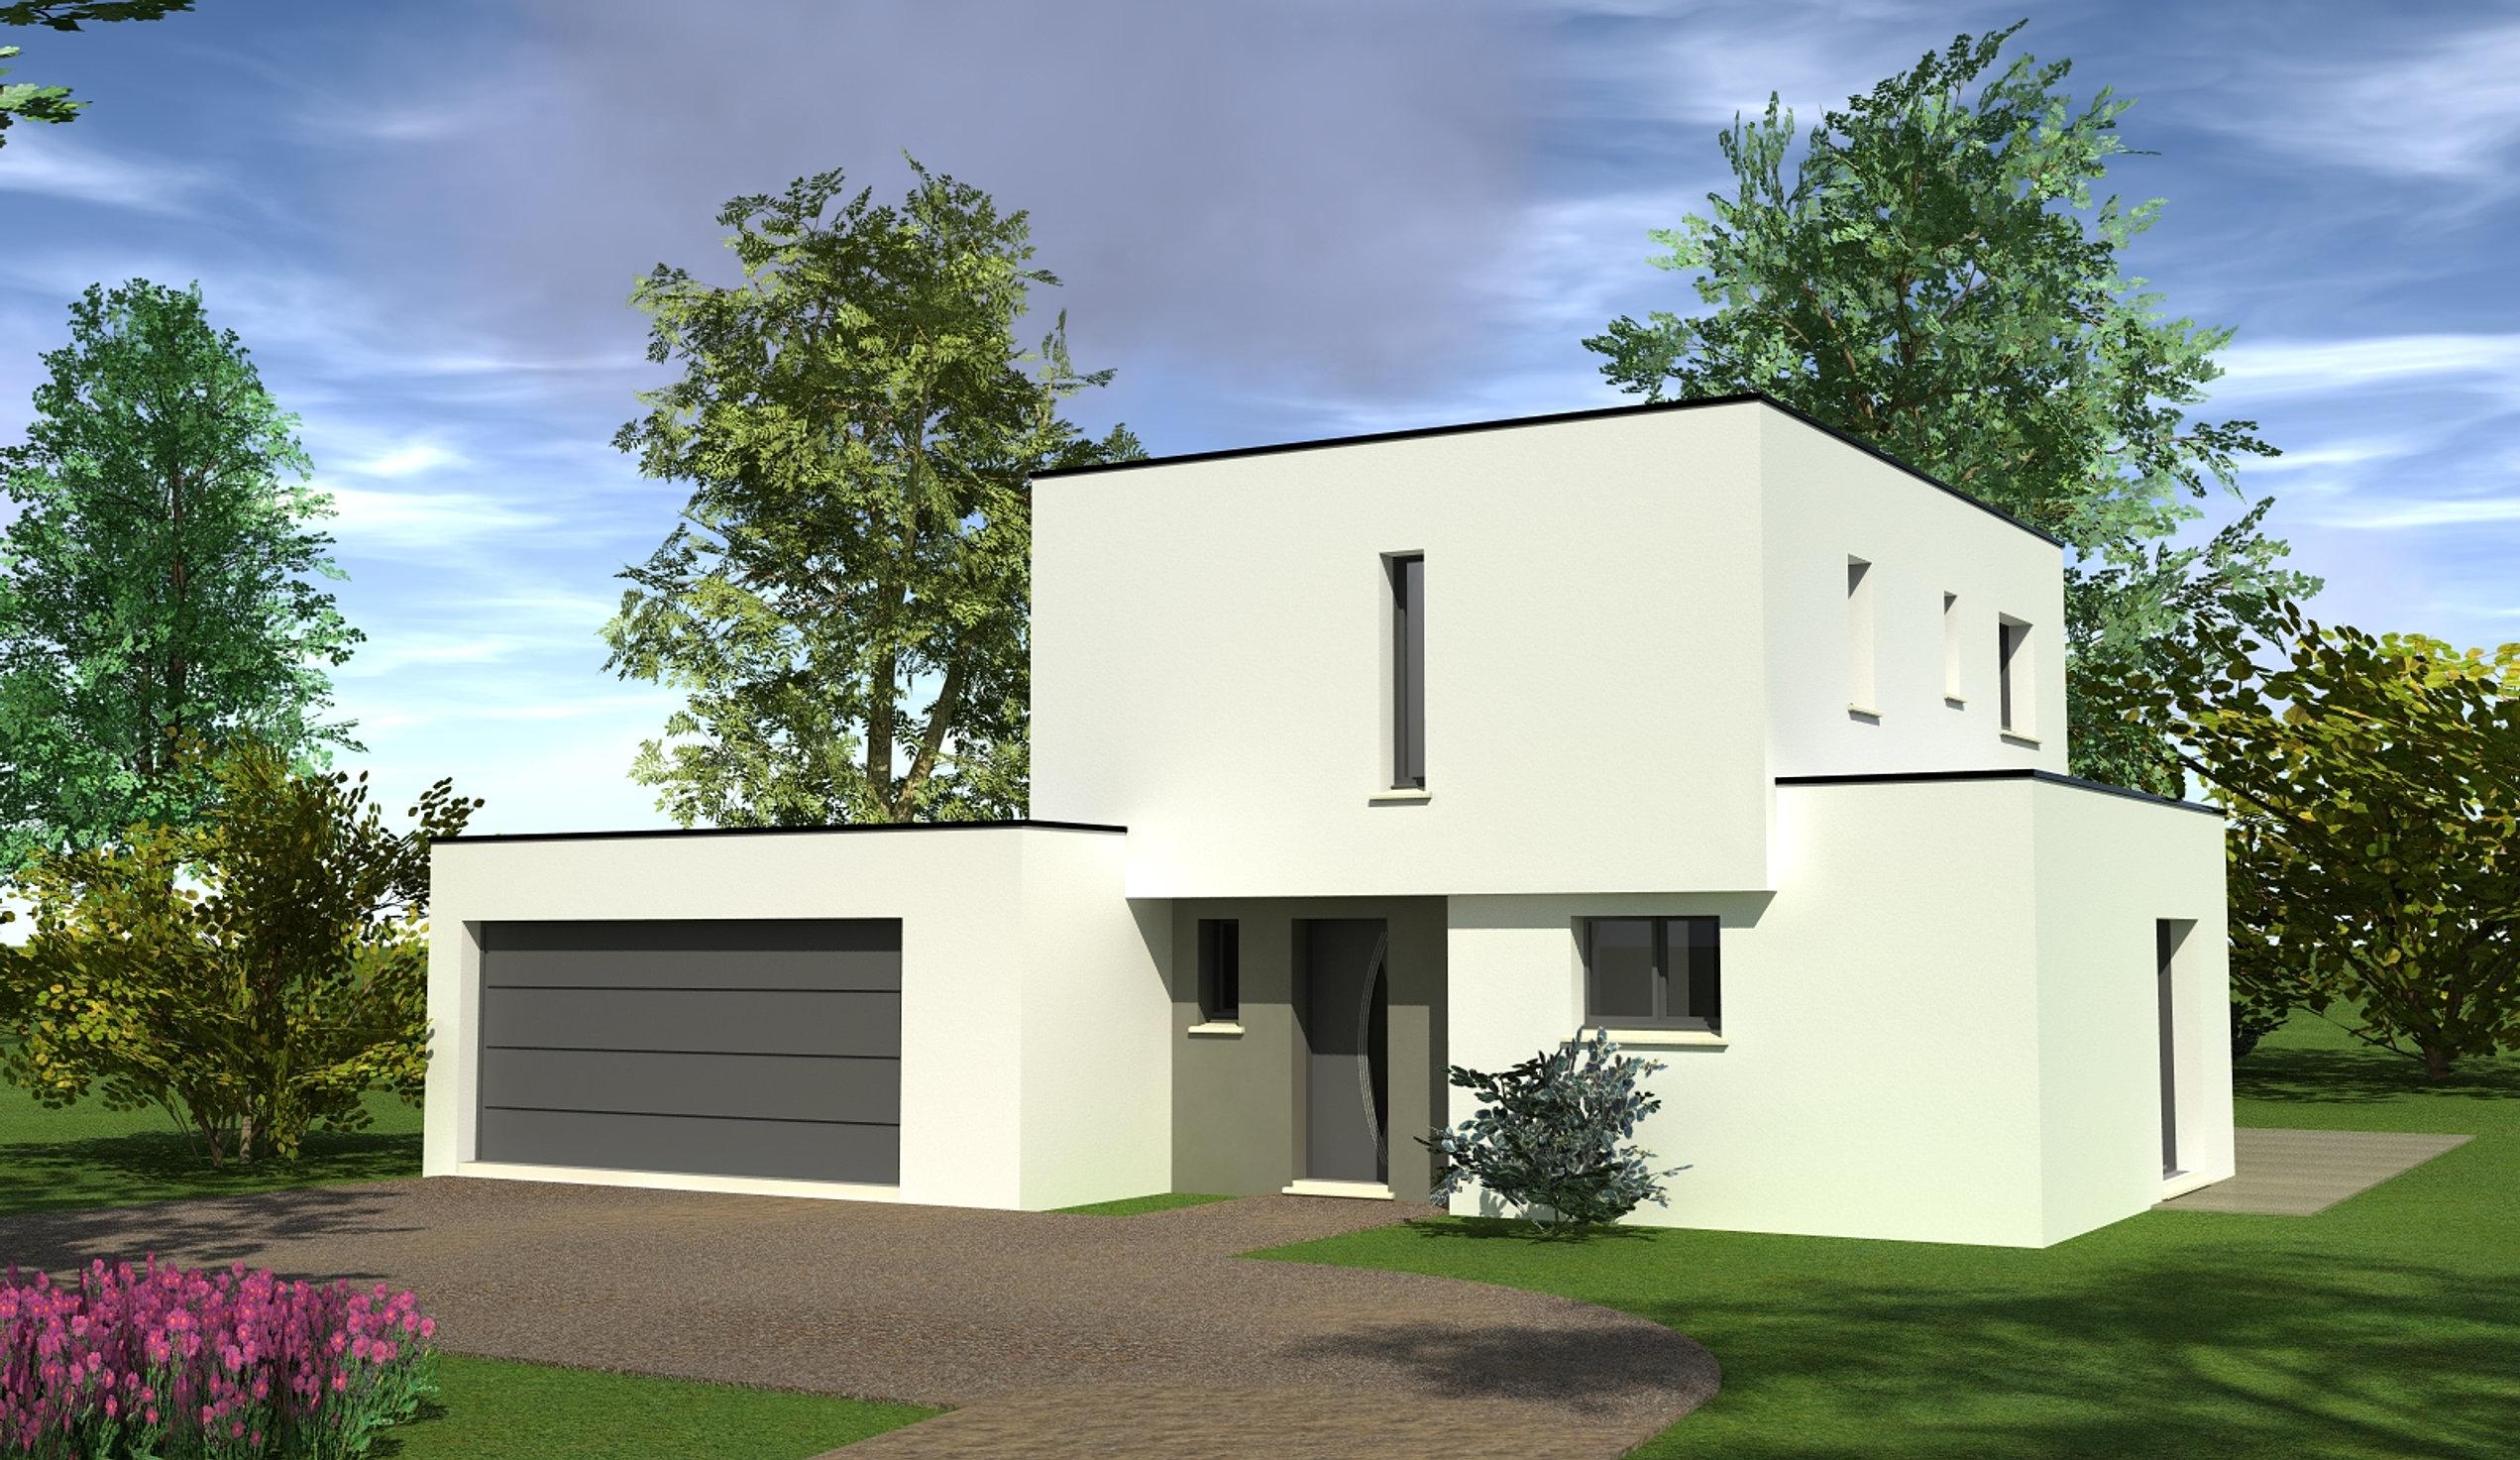 Modele maison awesome faience pour couloir decoration - Faience pour couloir ...